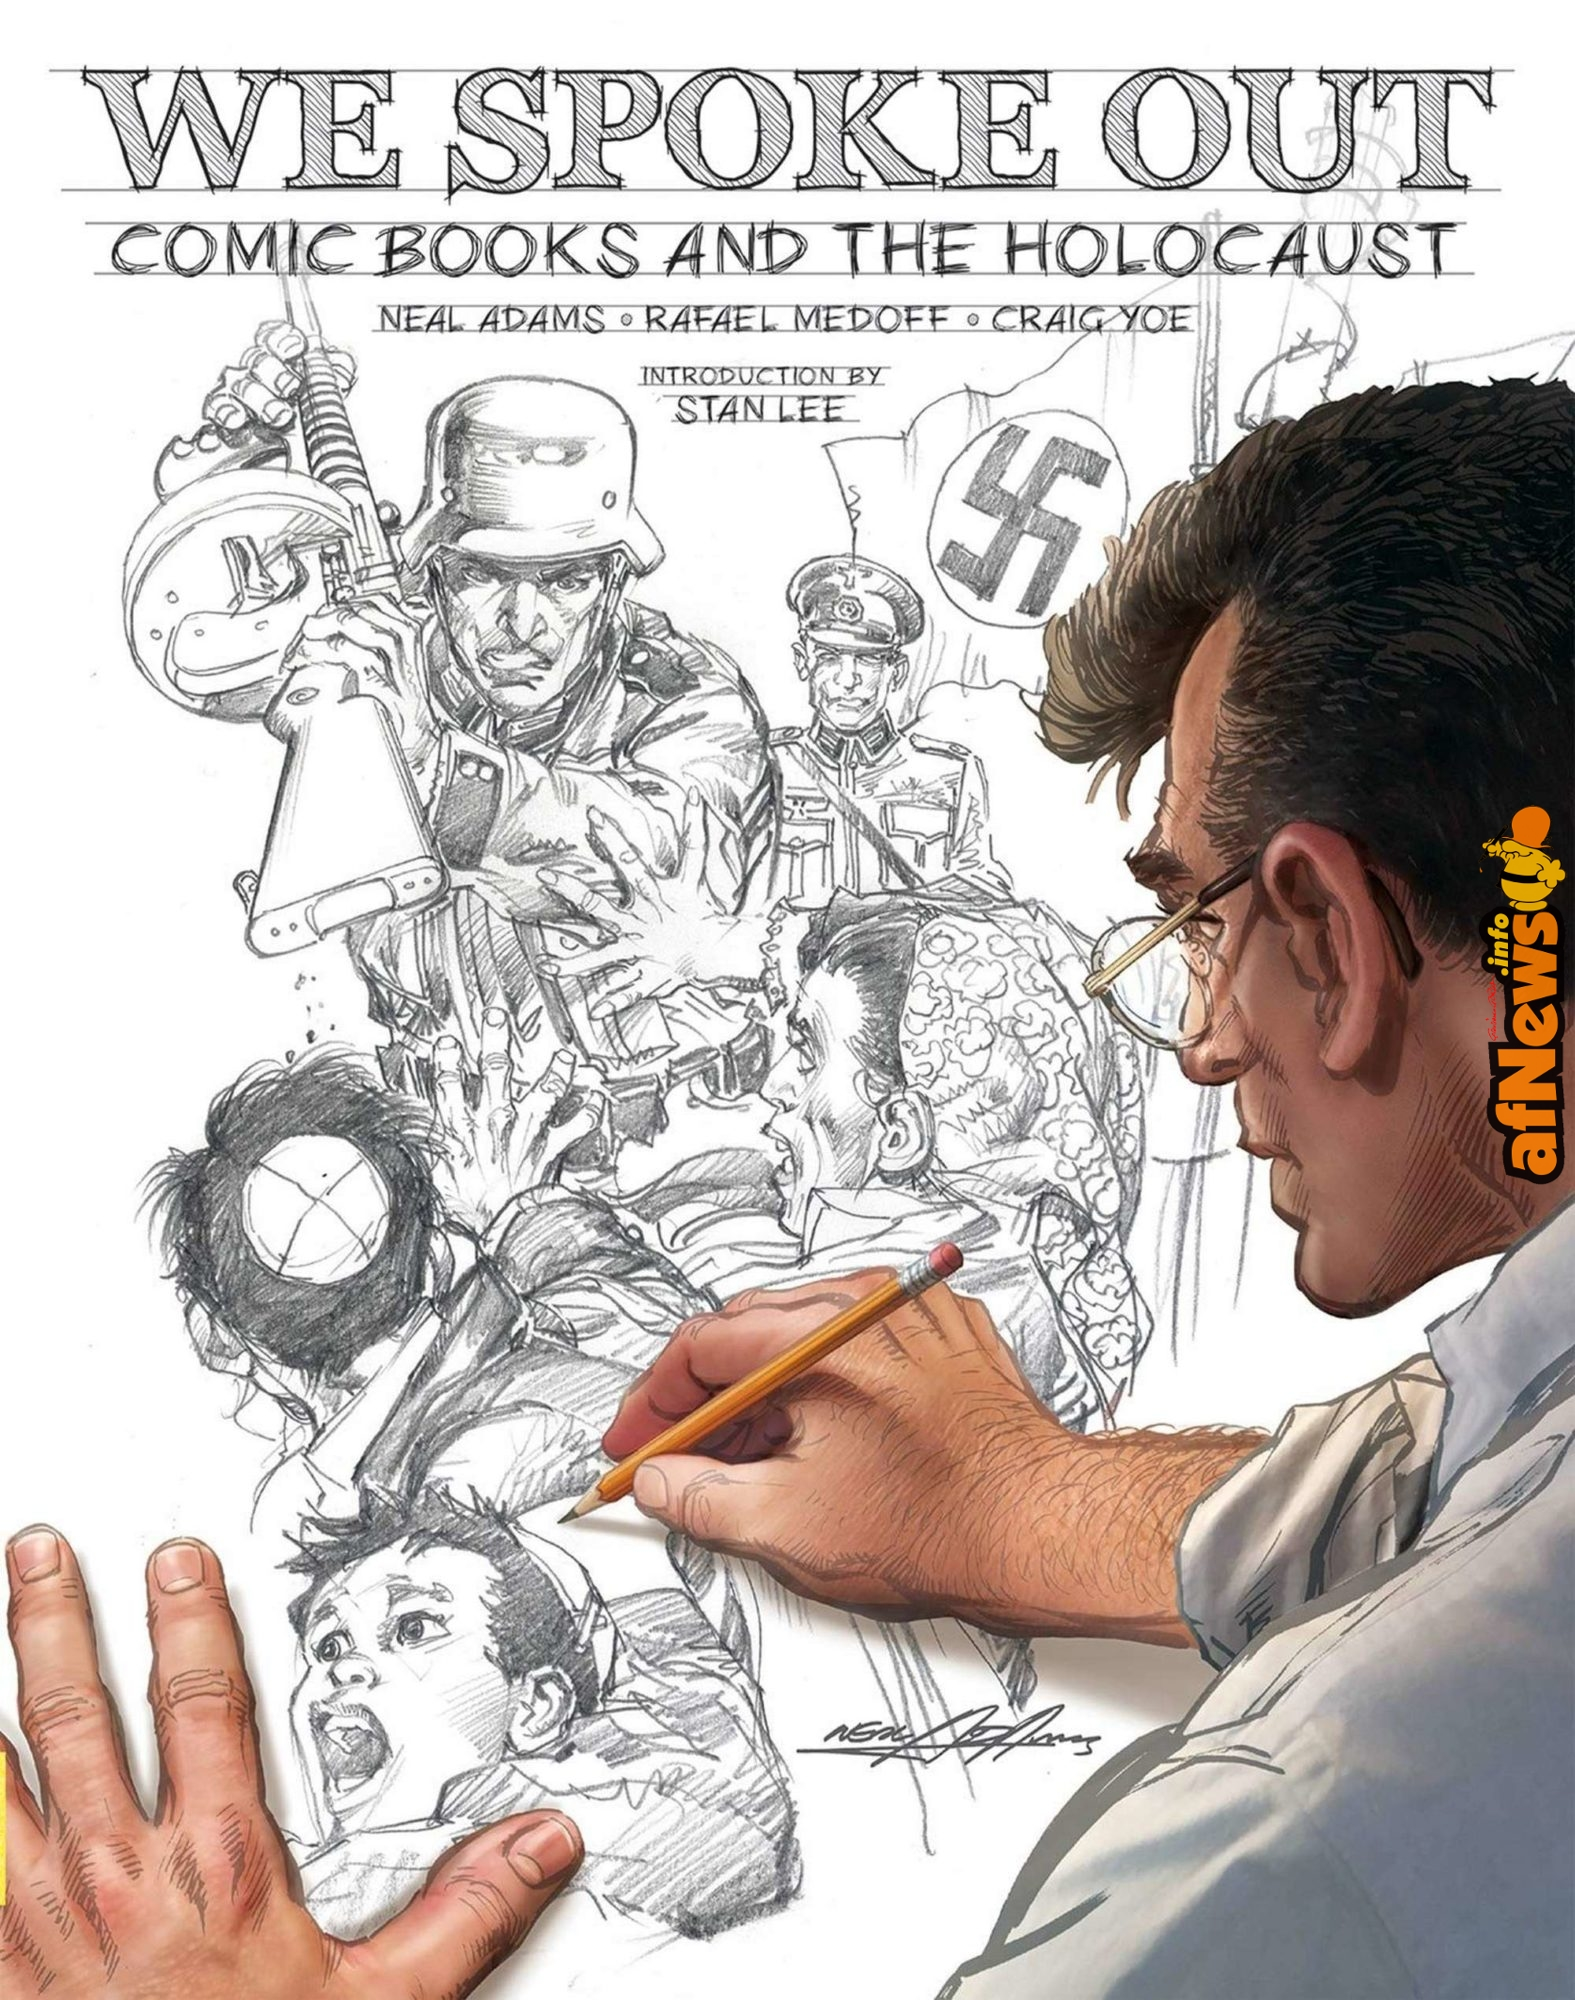 We spoke out: antologia di fumetti sulla Shoah - afnews.info